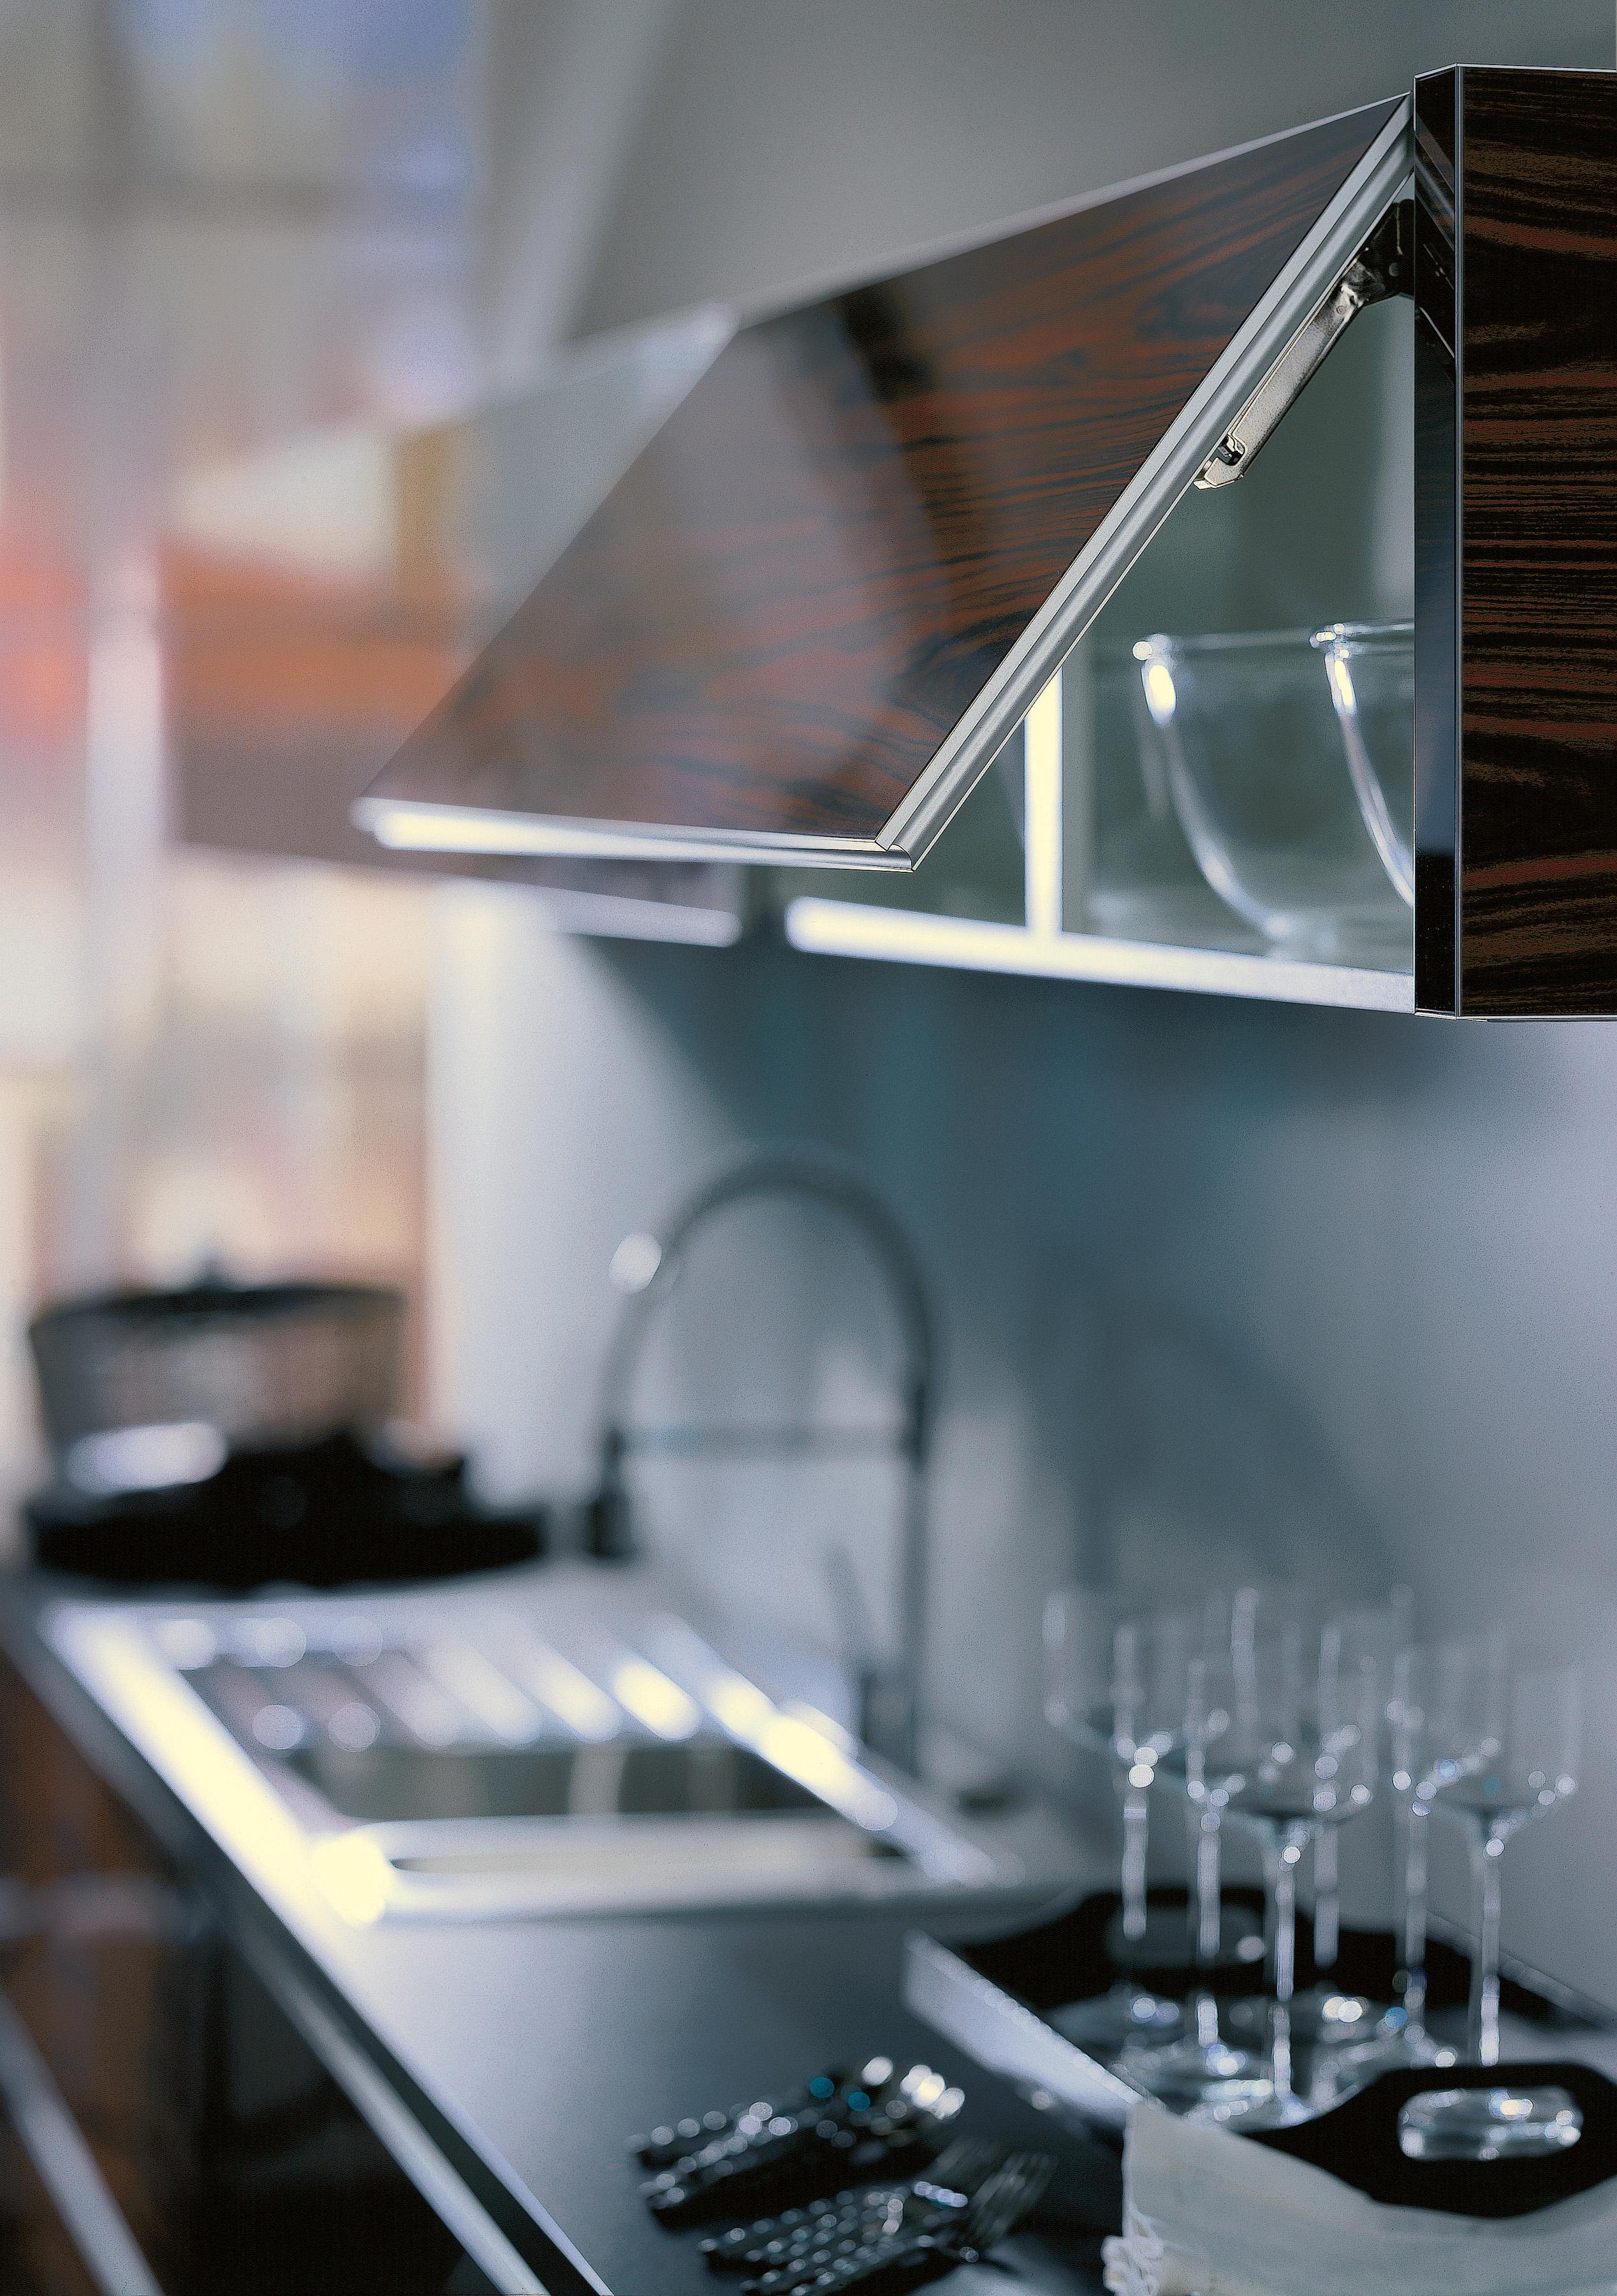 Alno kitchen cabinets chicago - Media